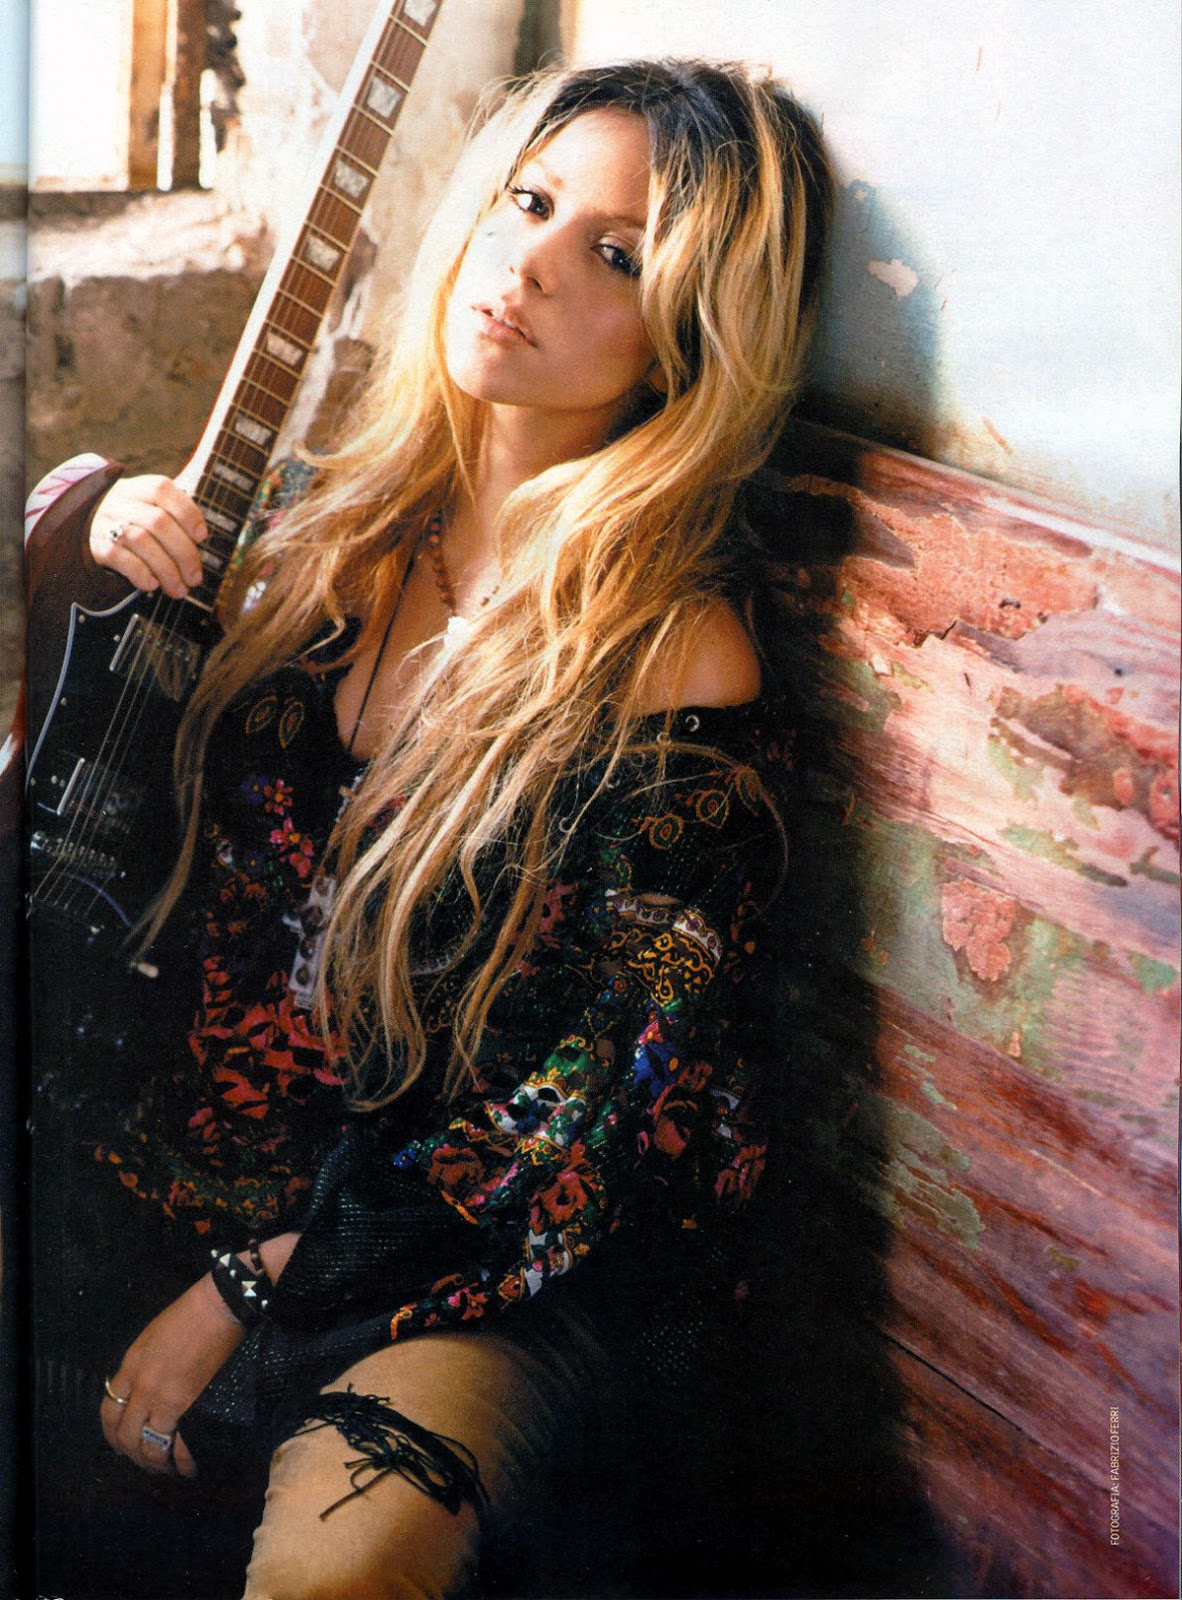 Shakira - Laundry Service | Flickr - Photo Sharing! |Shakira Laundry Service Photoshoot